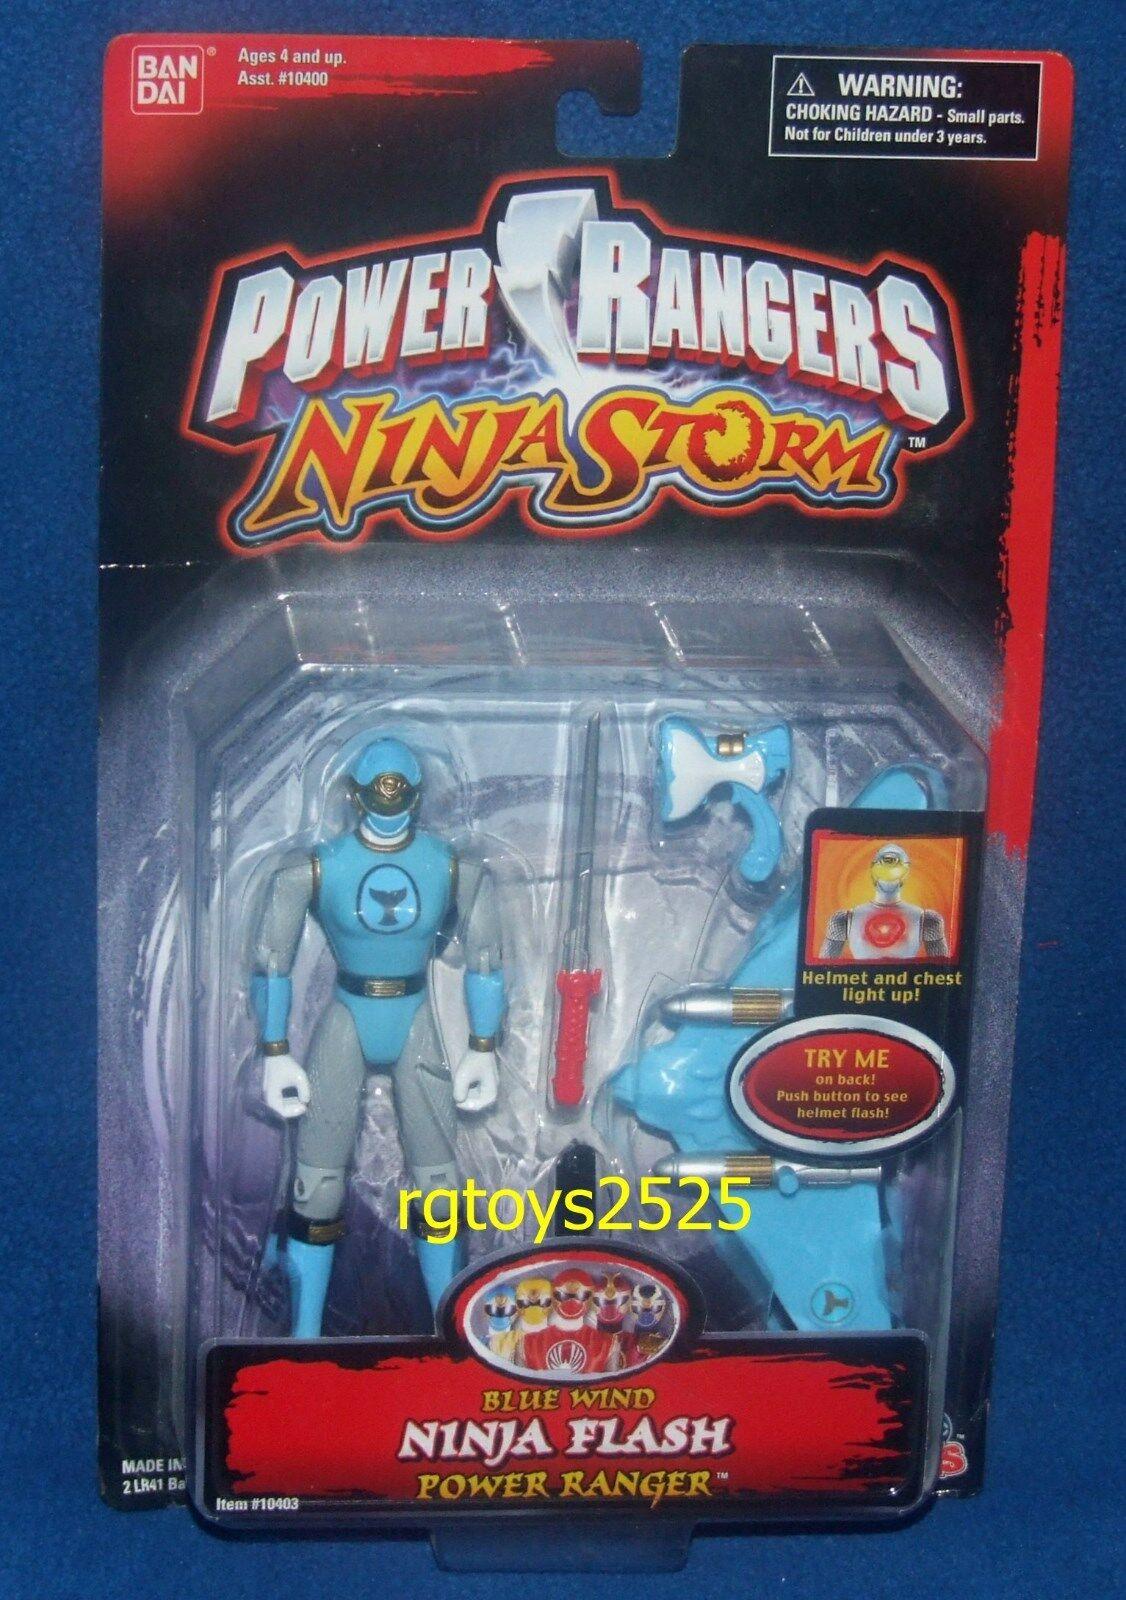 Power rangers ninja sturm 5  Blau wind ninja - power ranger neu versiegelt